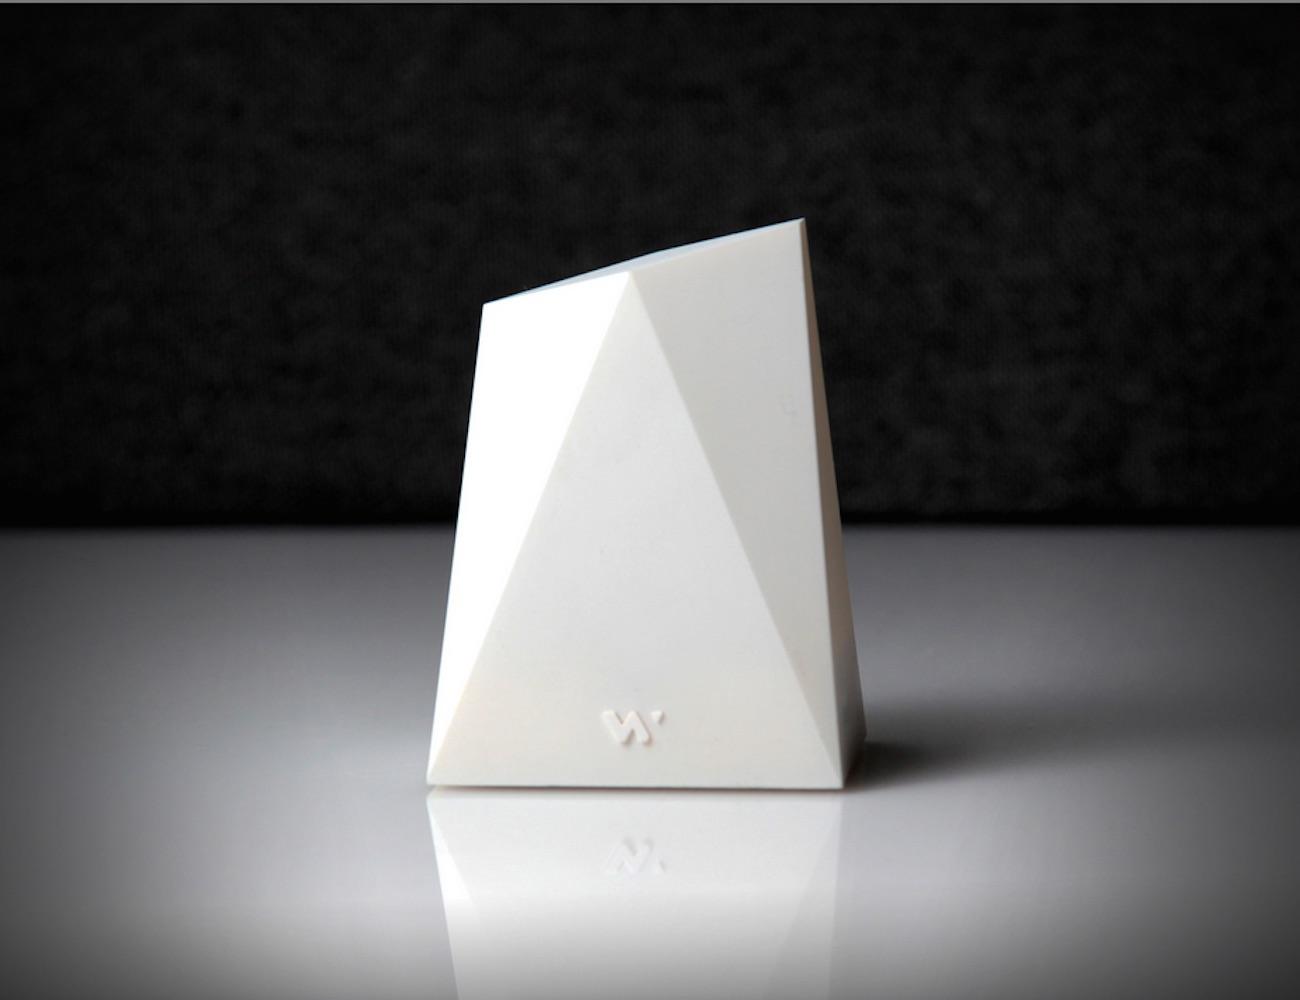 Notti App-Enabled Smart Light